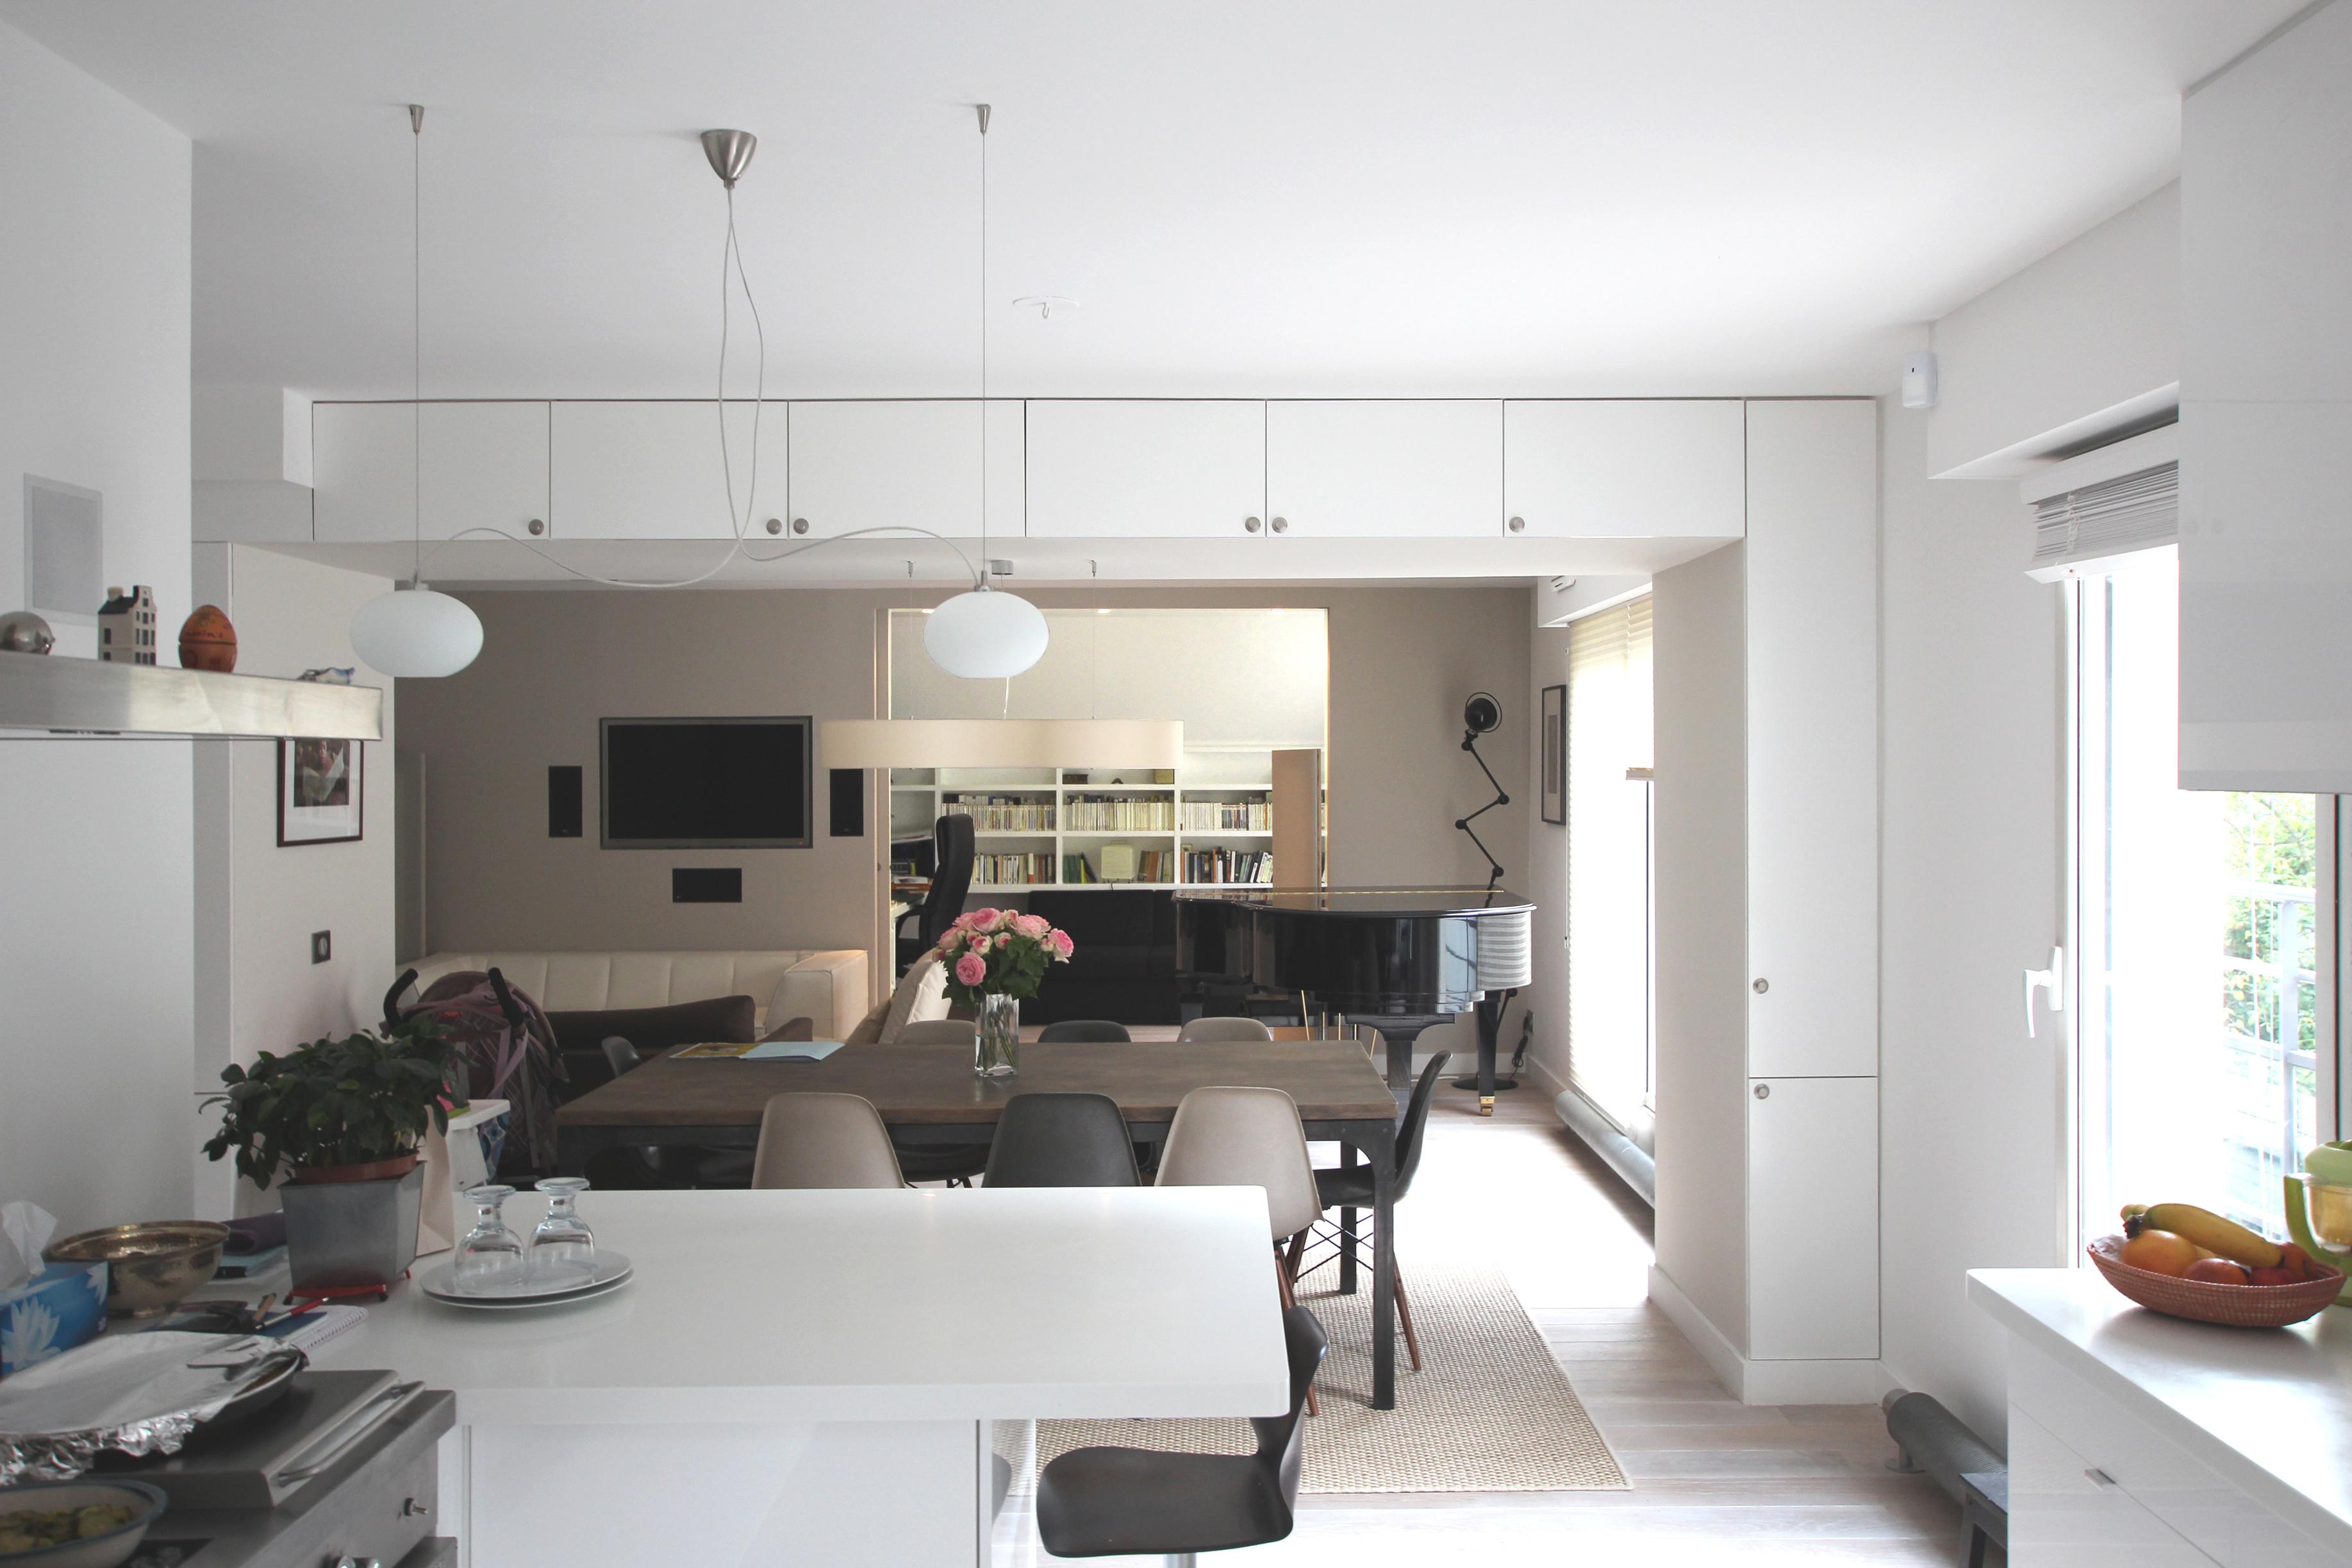 perspective longitudinale du salon depuis la cuisine. Black Bedroom Furniture Sets. Home Design Ideas